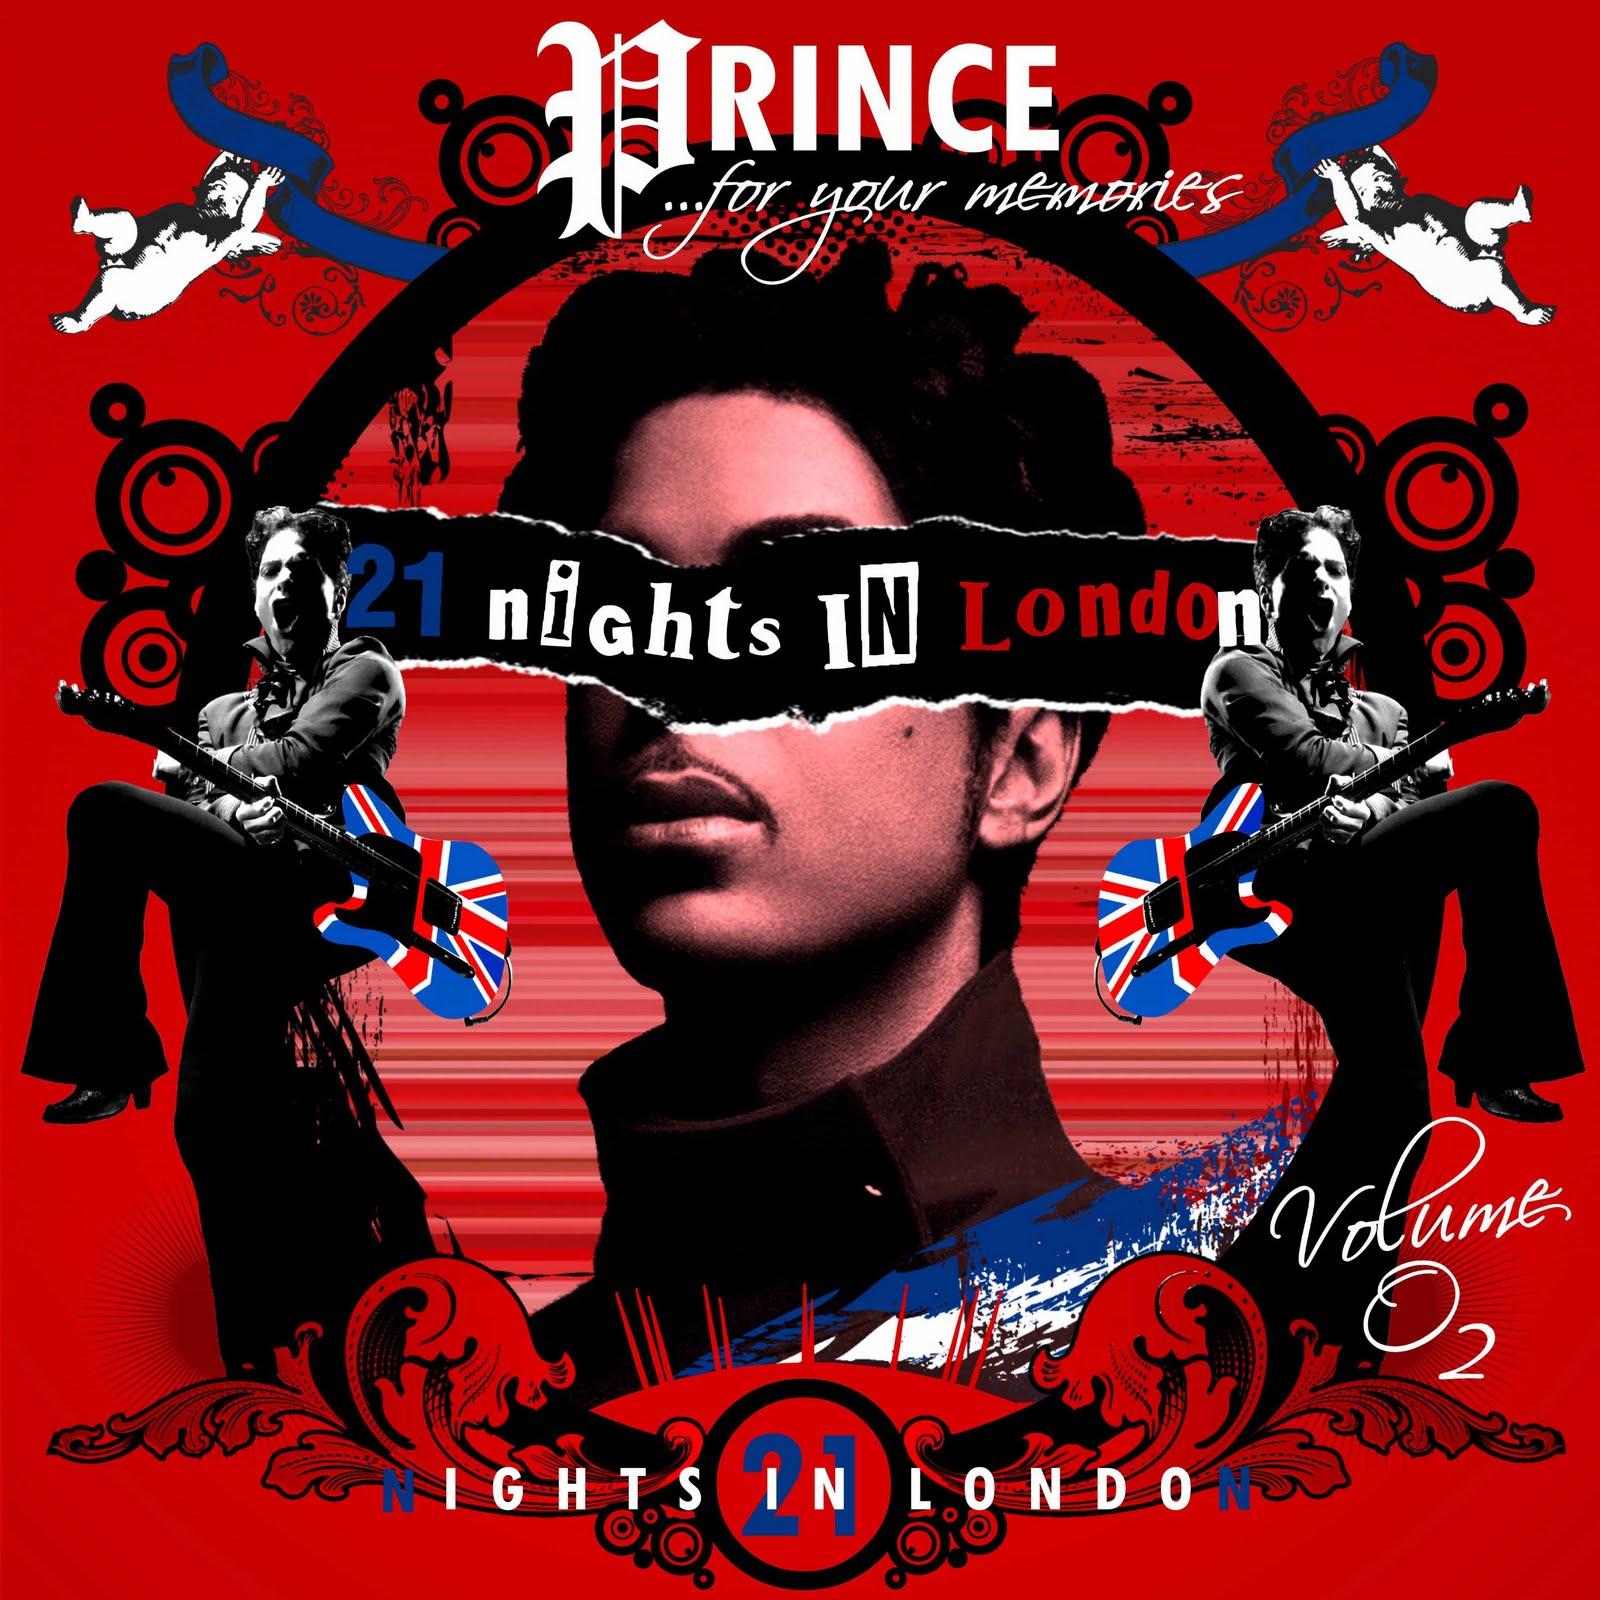 Concert Amp Live Prince Live At O2 Arena London 3